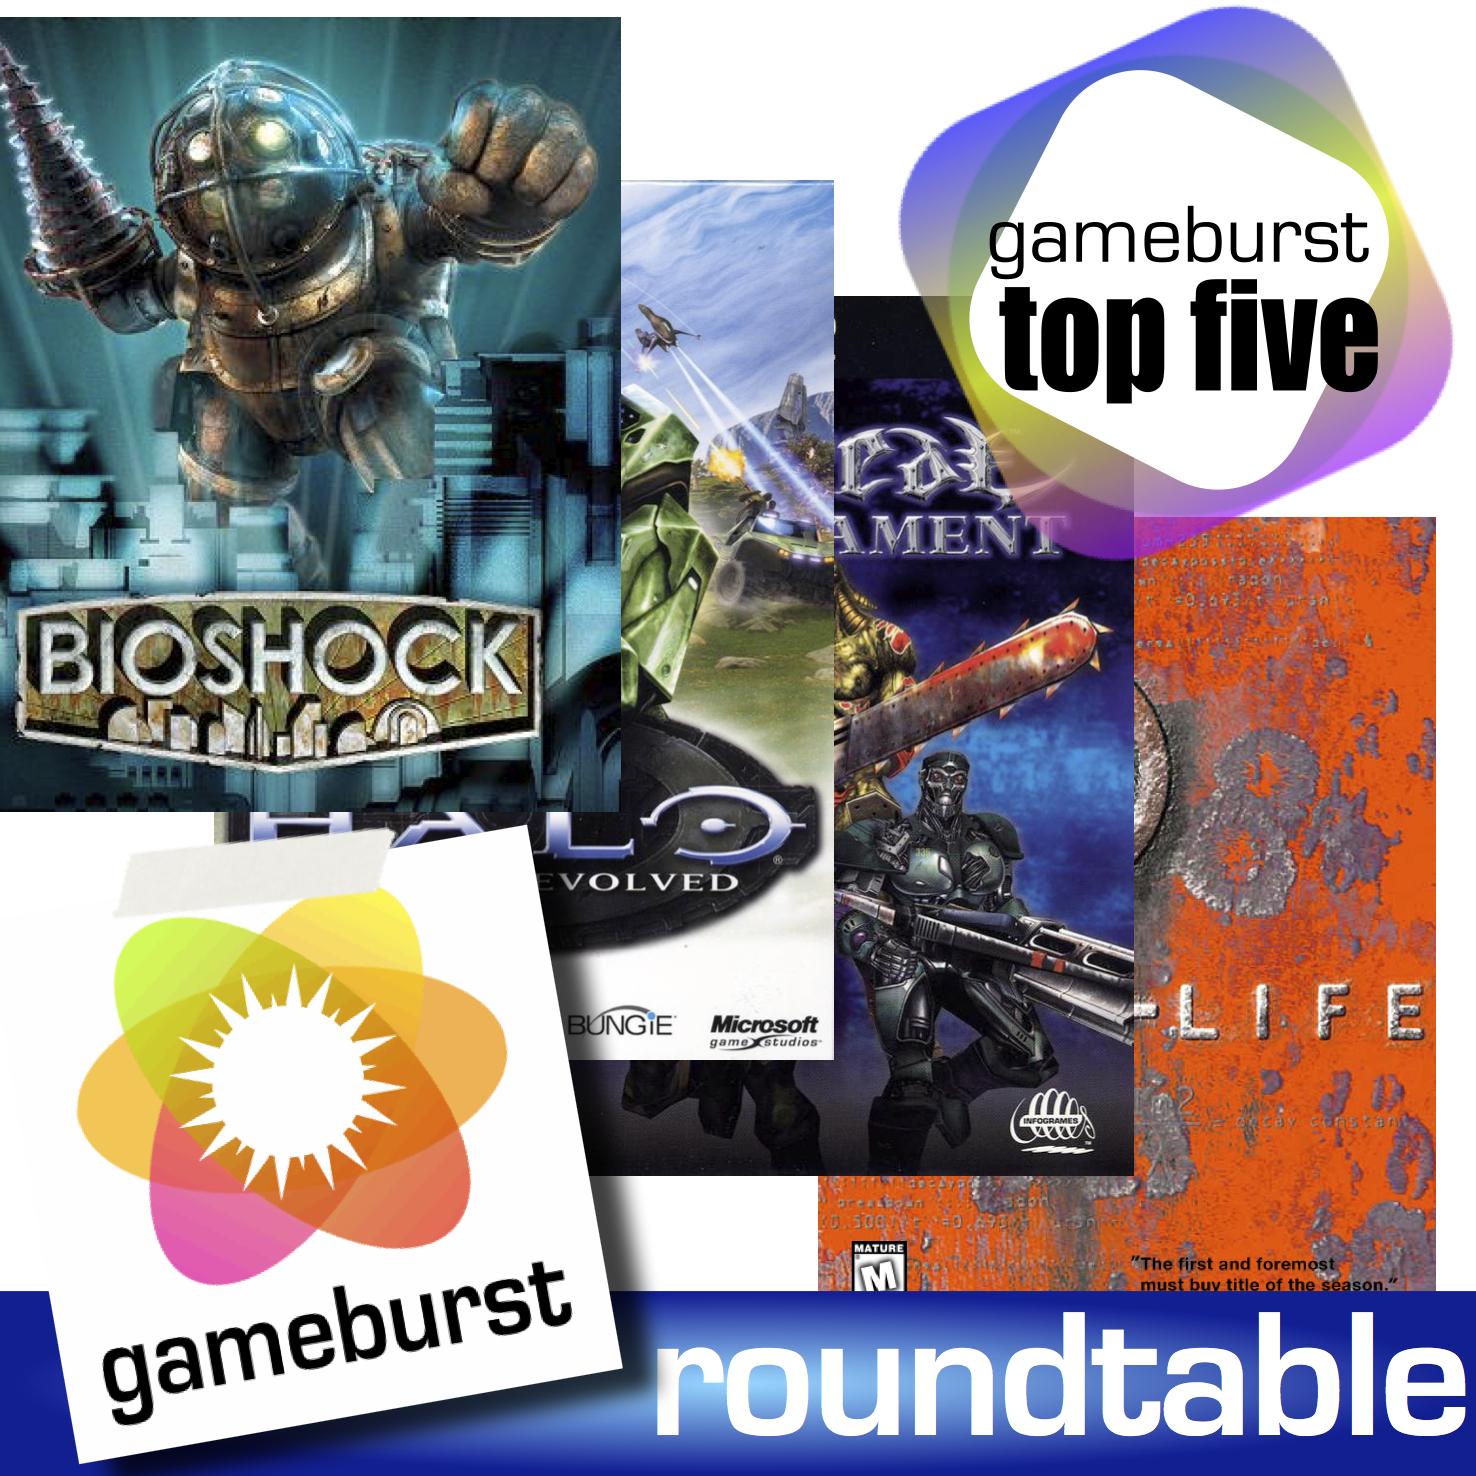 GameBurst Roundtable - Top 5 FPS